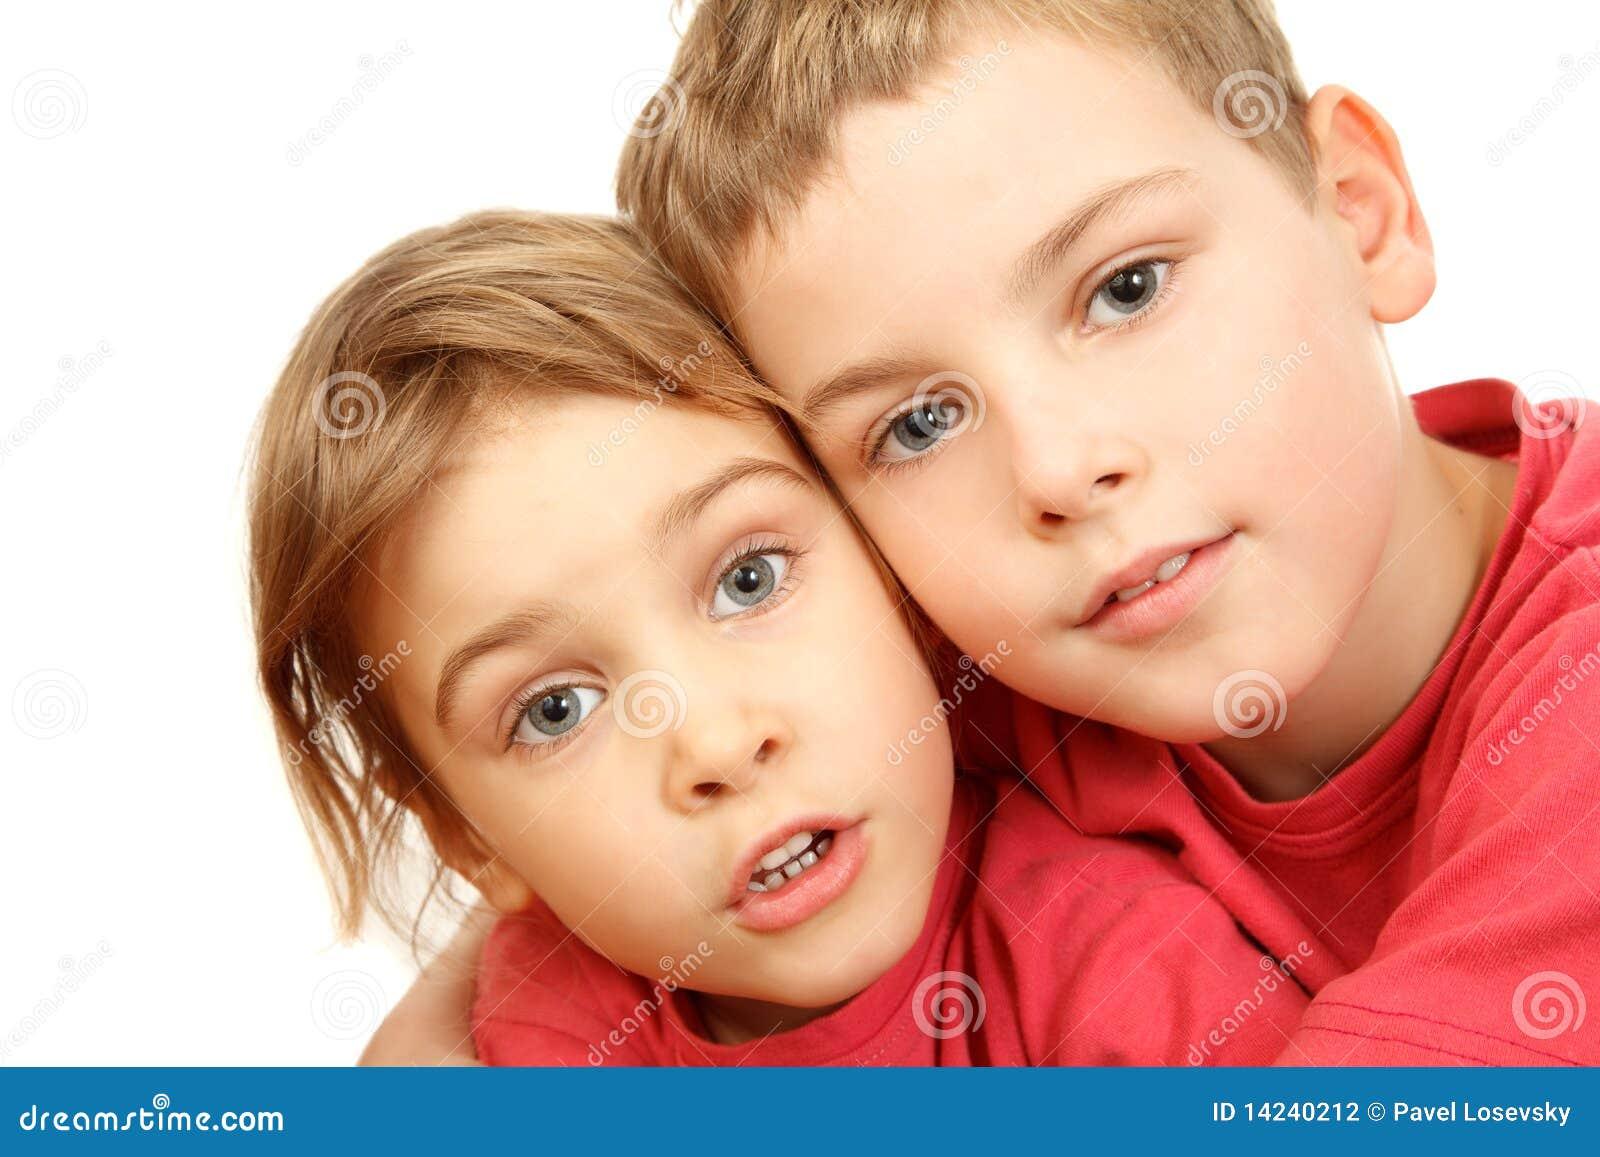 brat-trahnul-krasivuyu-sestrenku